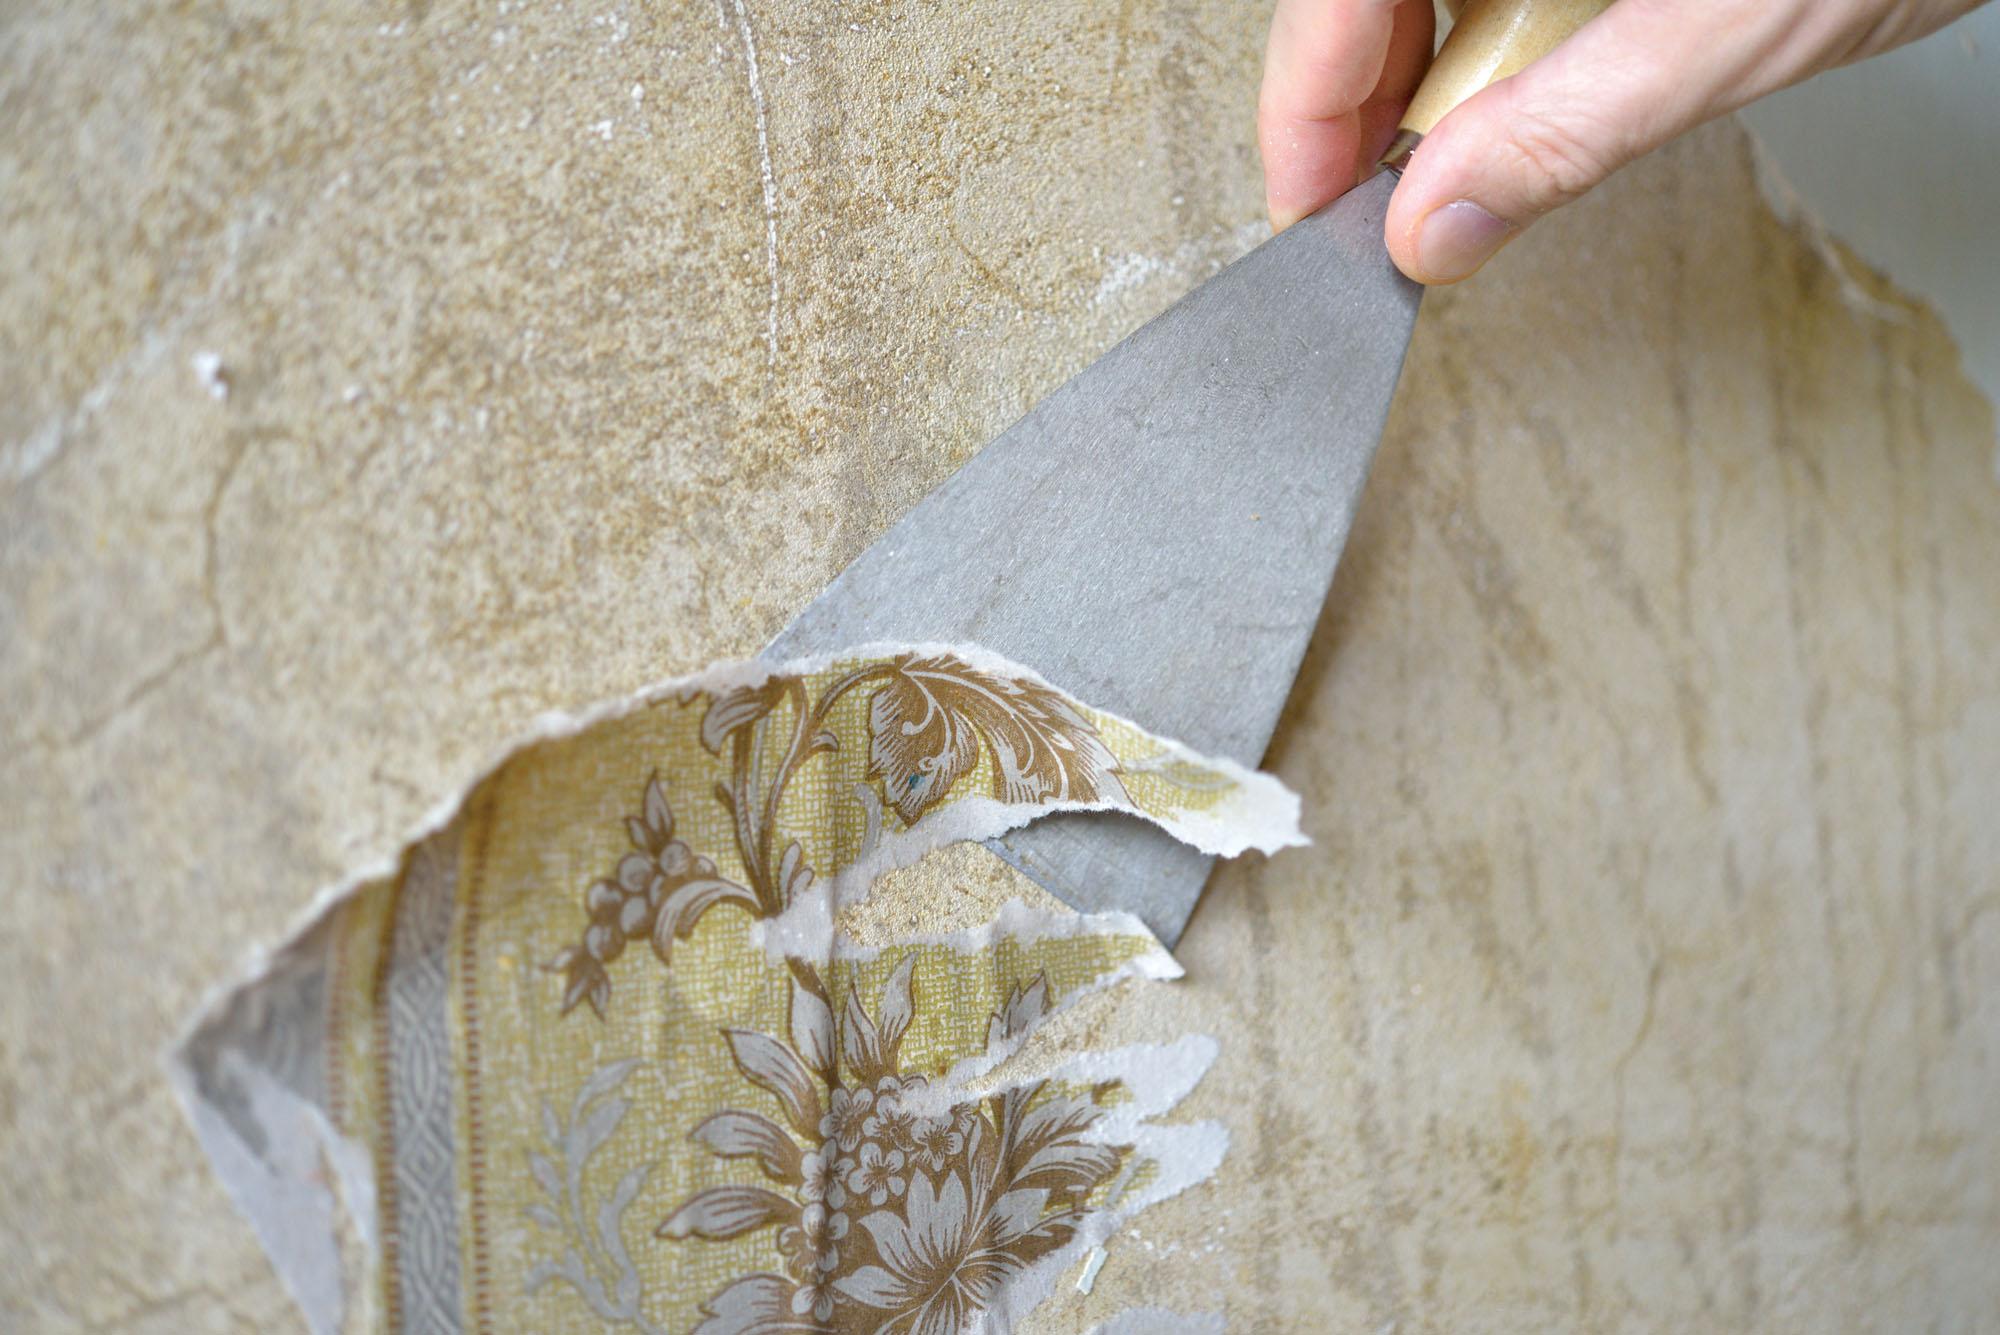 Prepping Plaster Walls For Paint Amp Wallpaper Restoration